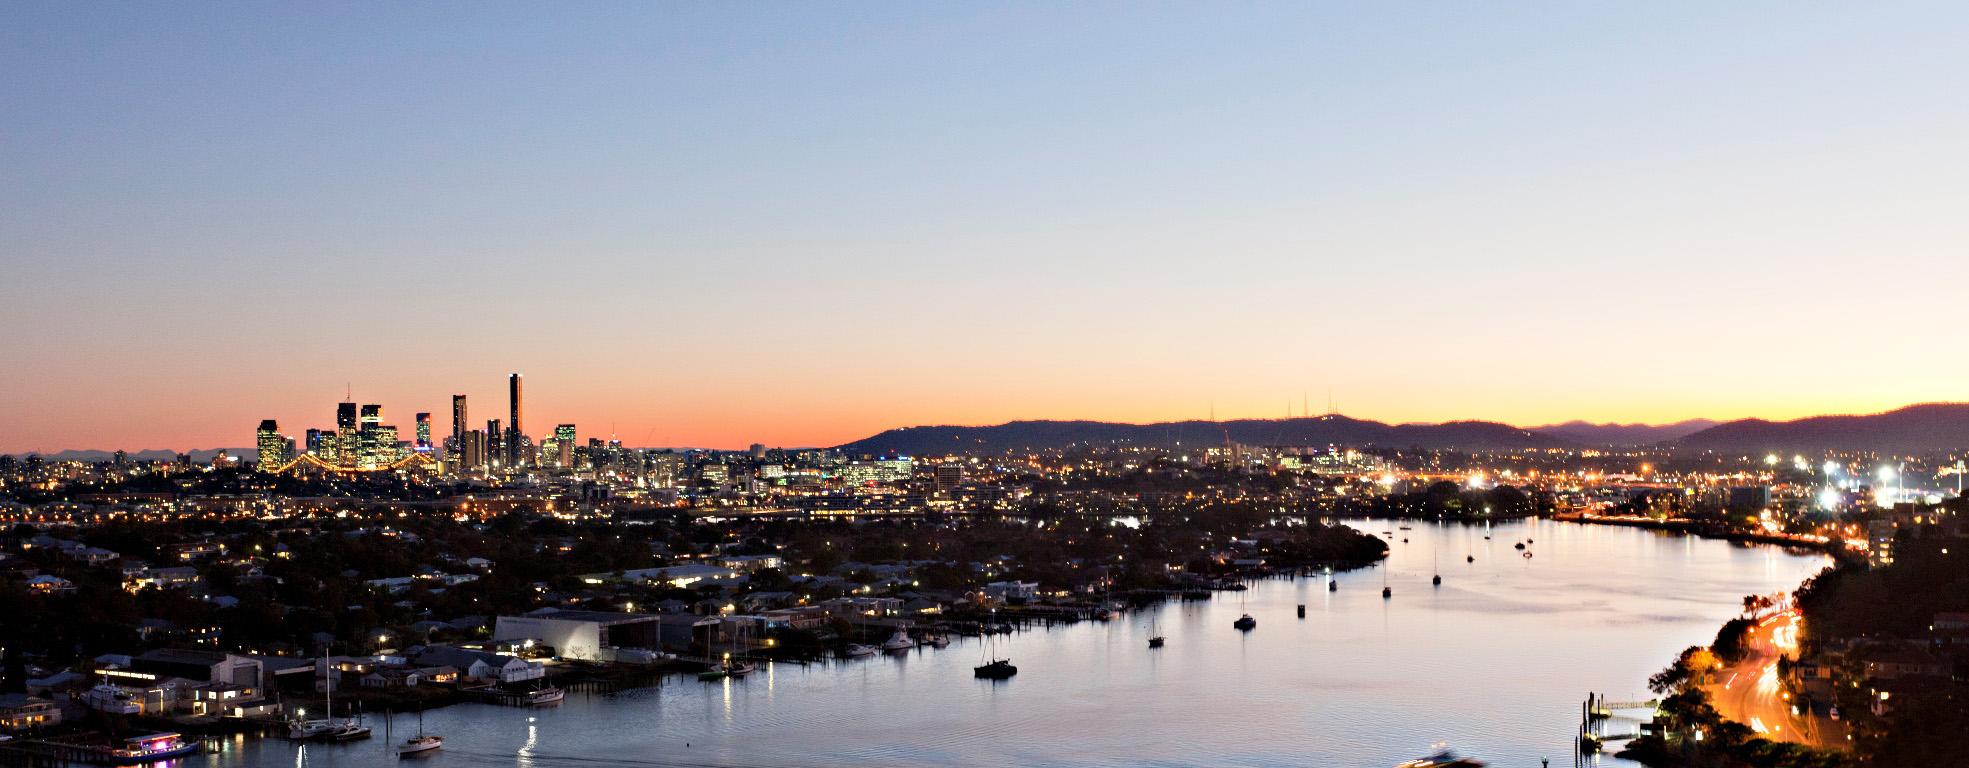 Rivers Edge - Hamilton - Night Aerial Shot 19 - 240614